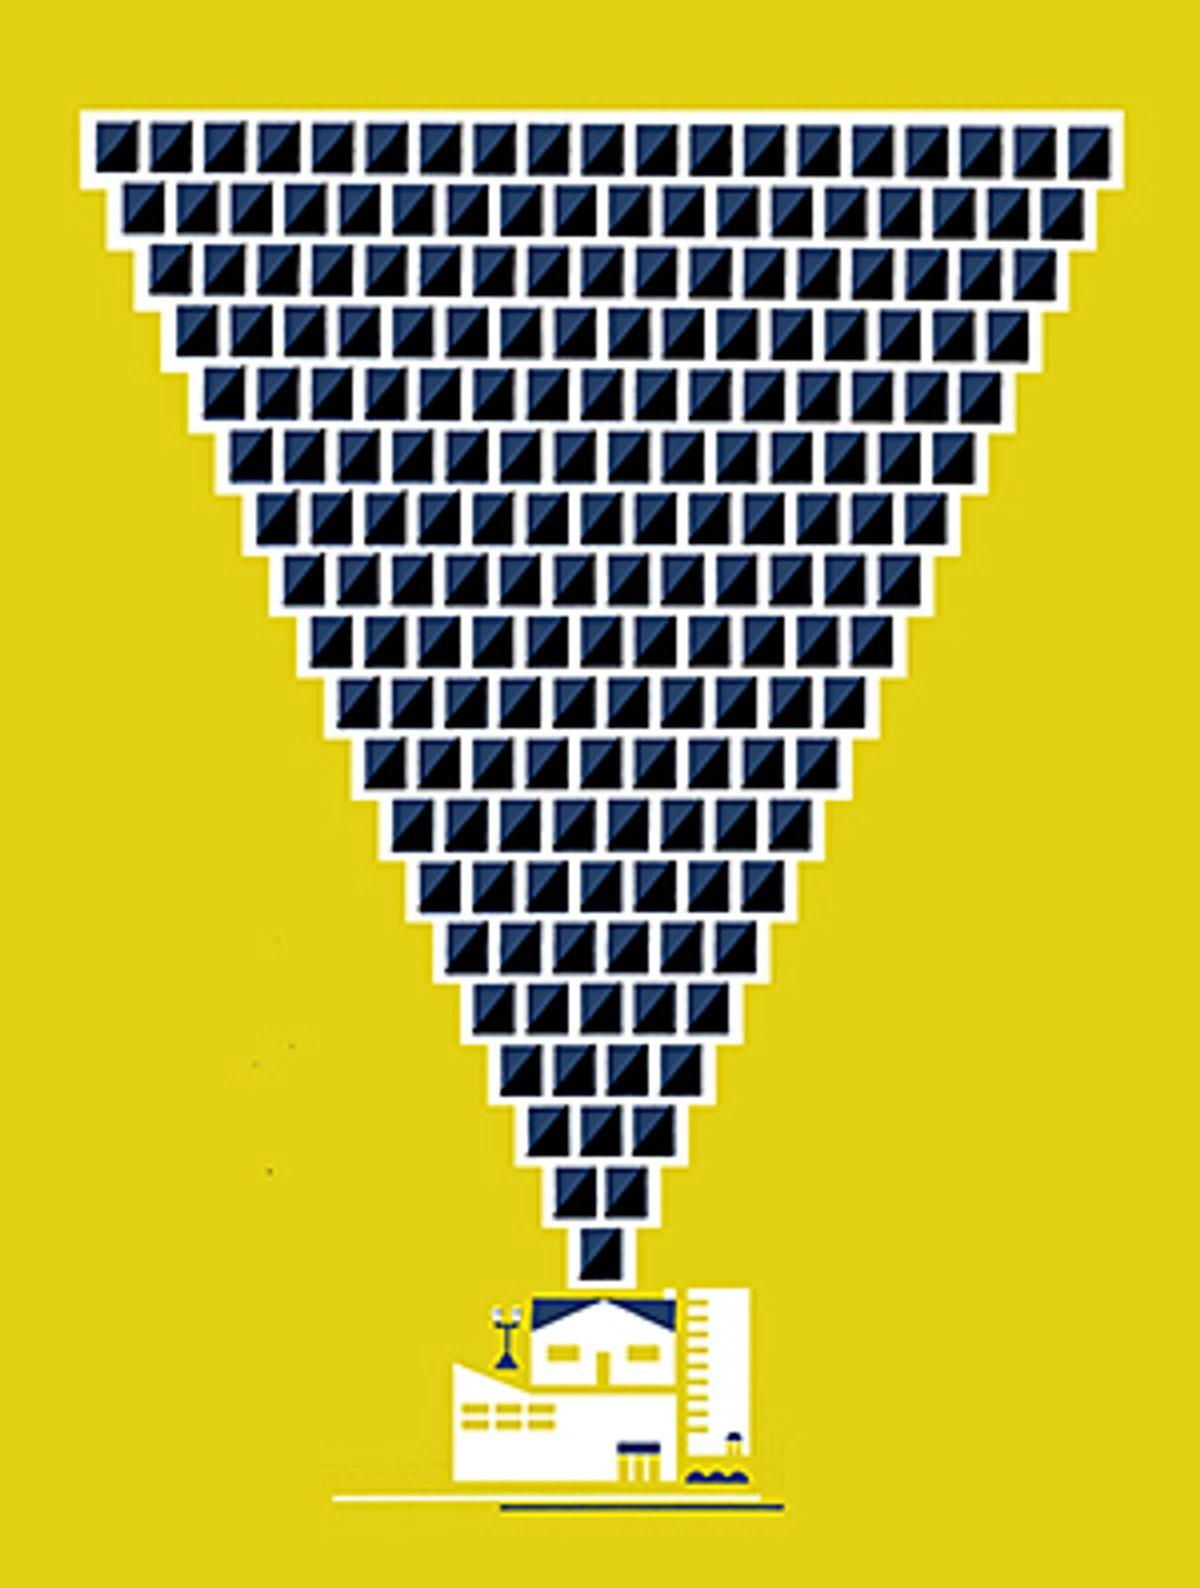 Topaz Turns On 9 Million Solar Panels